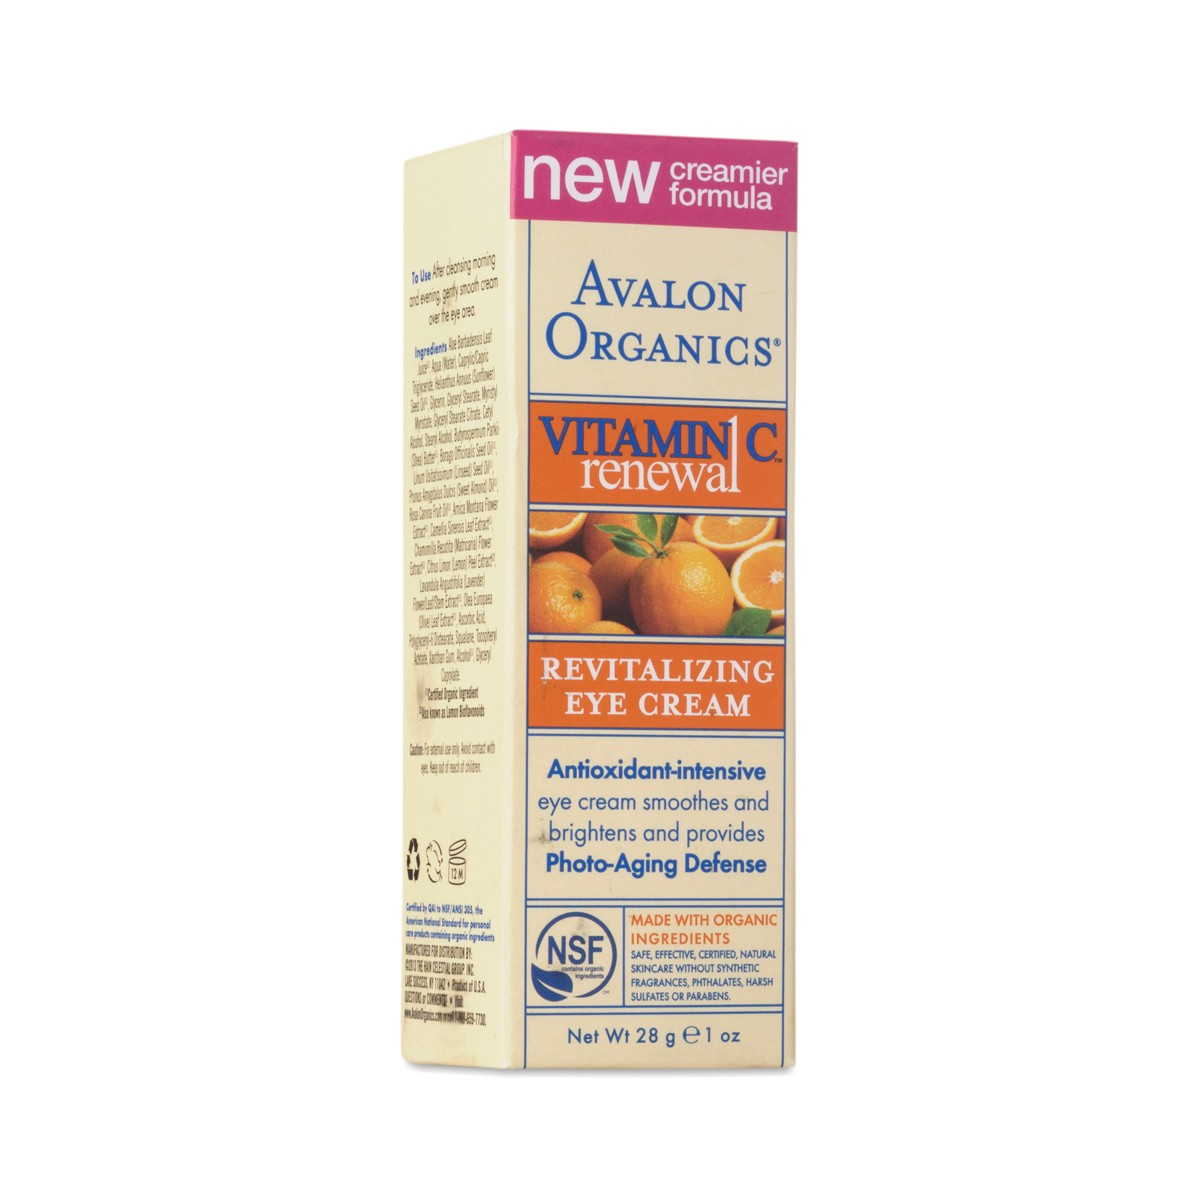 Avalon organics eye cream review